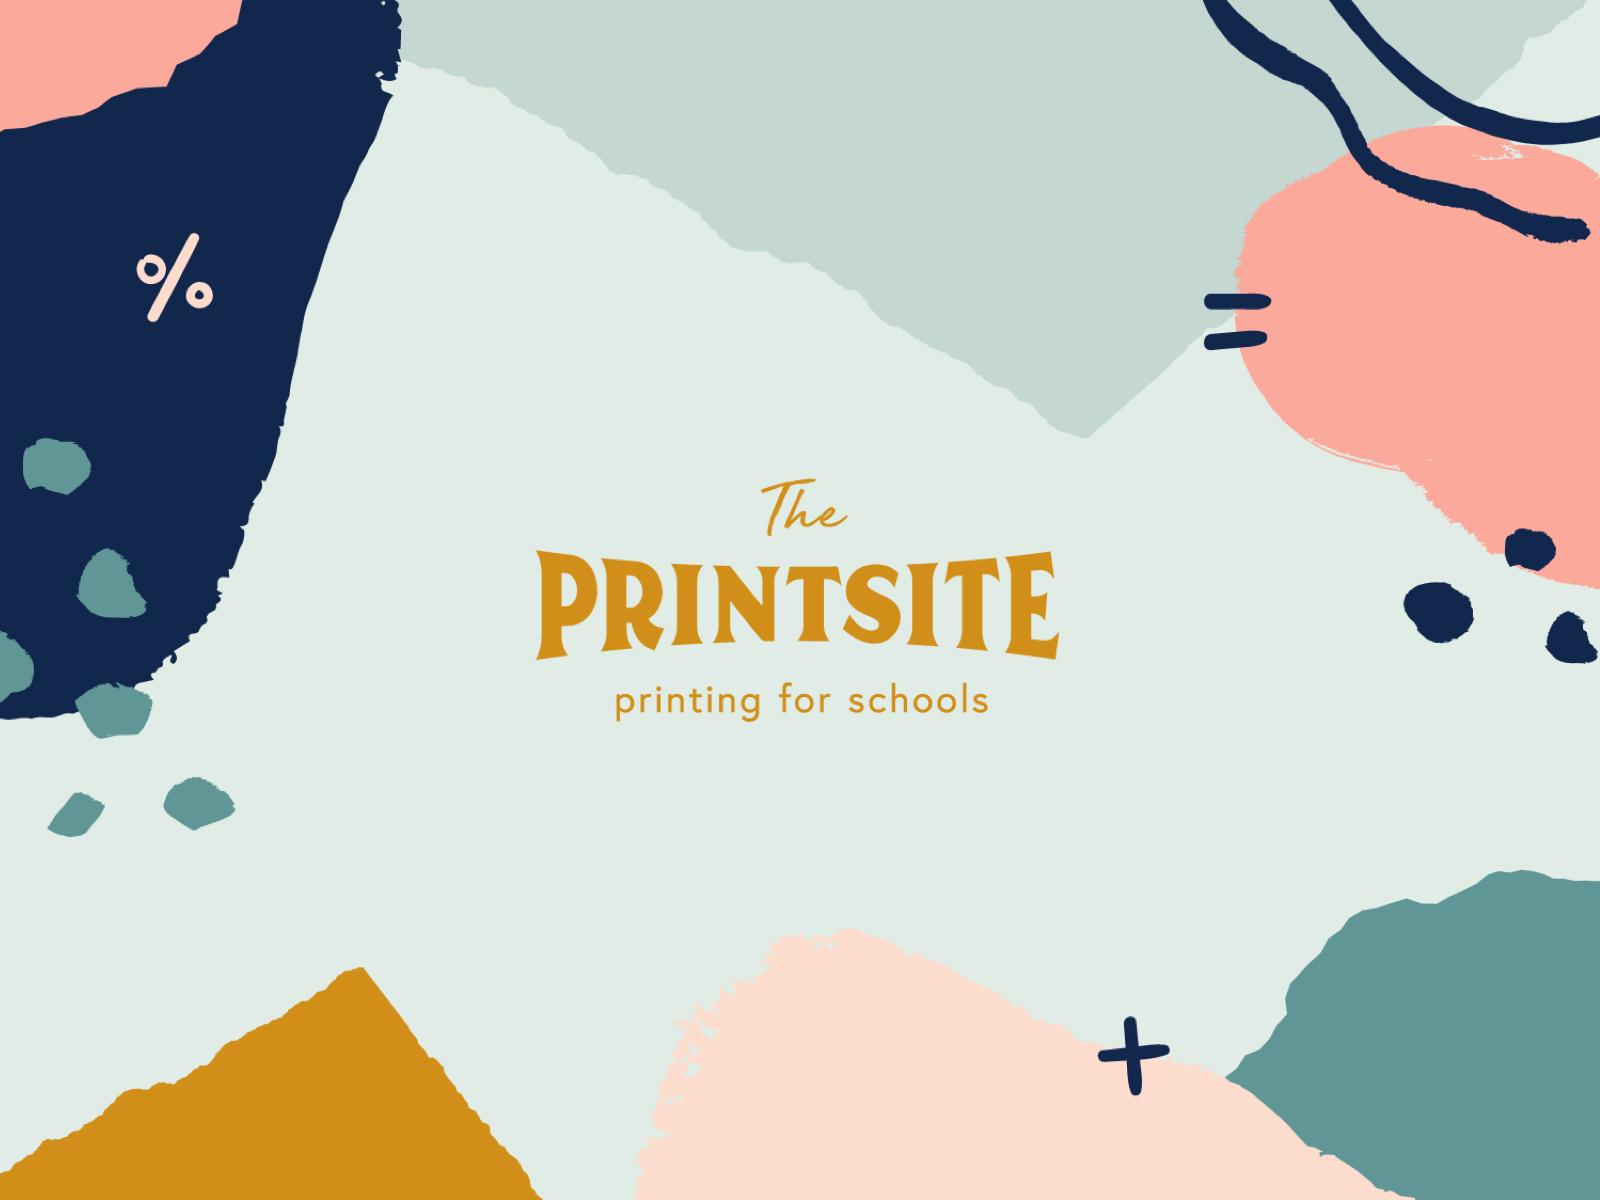 The Printsite — Printing for Schools